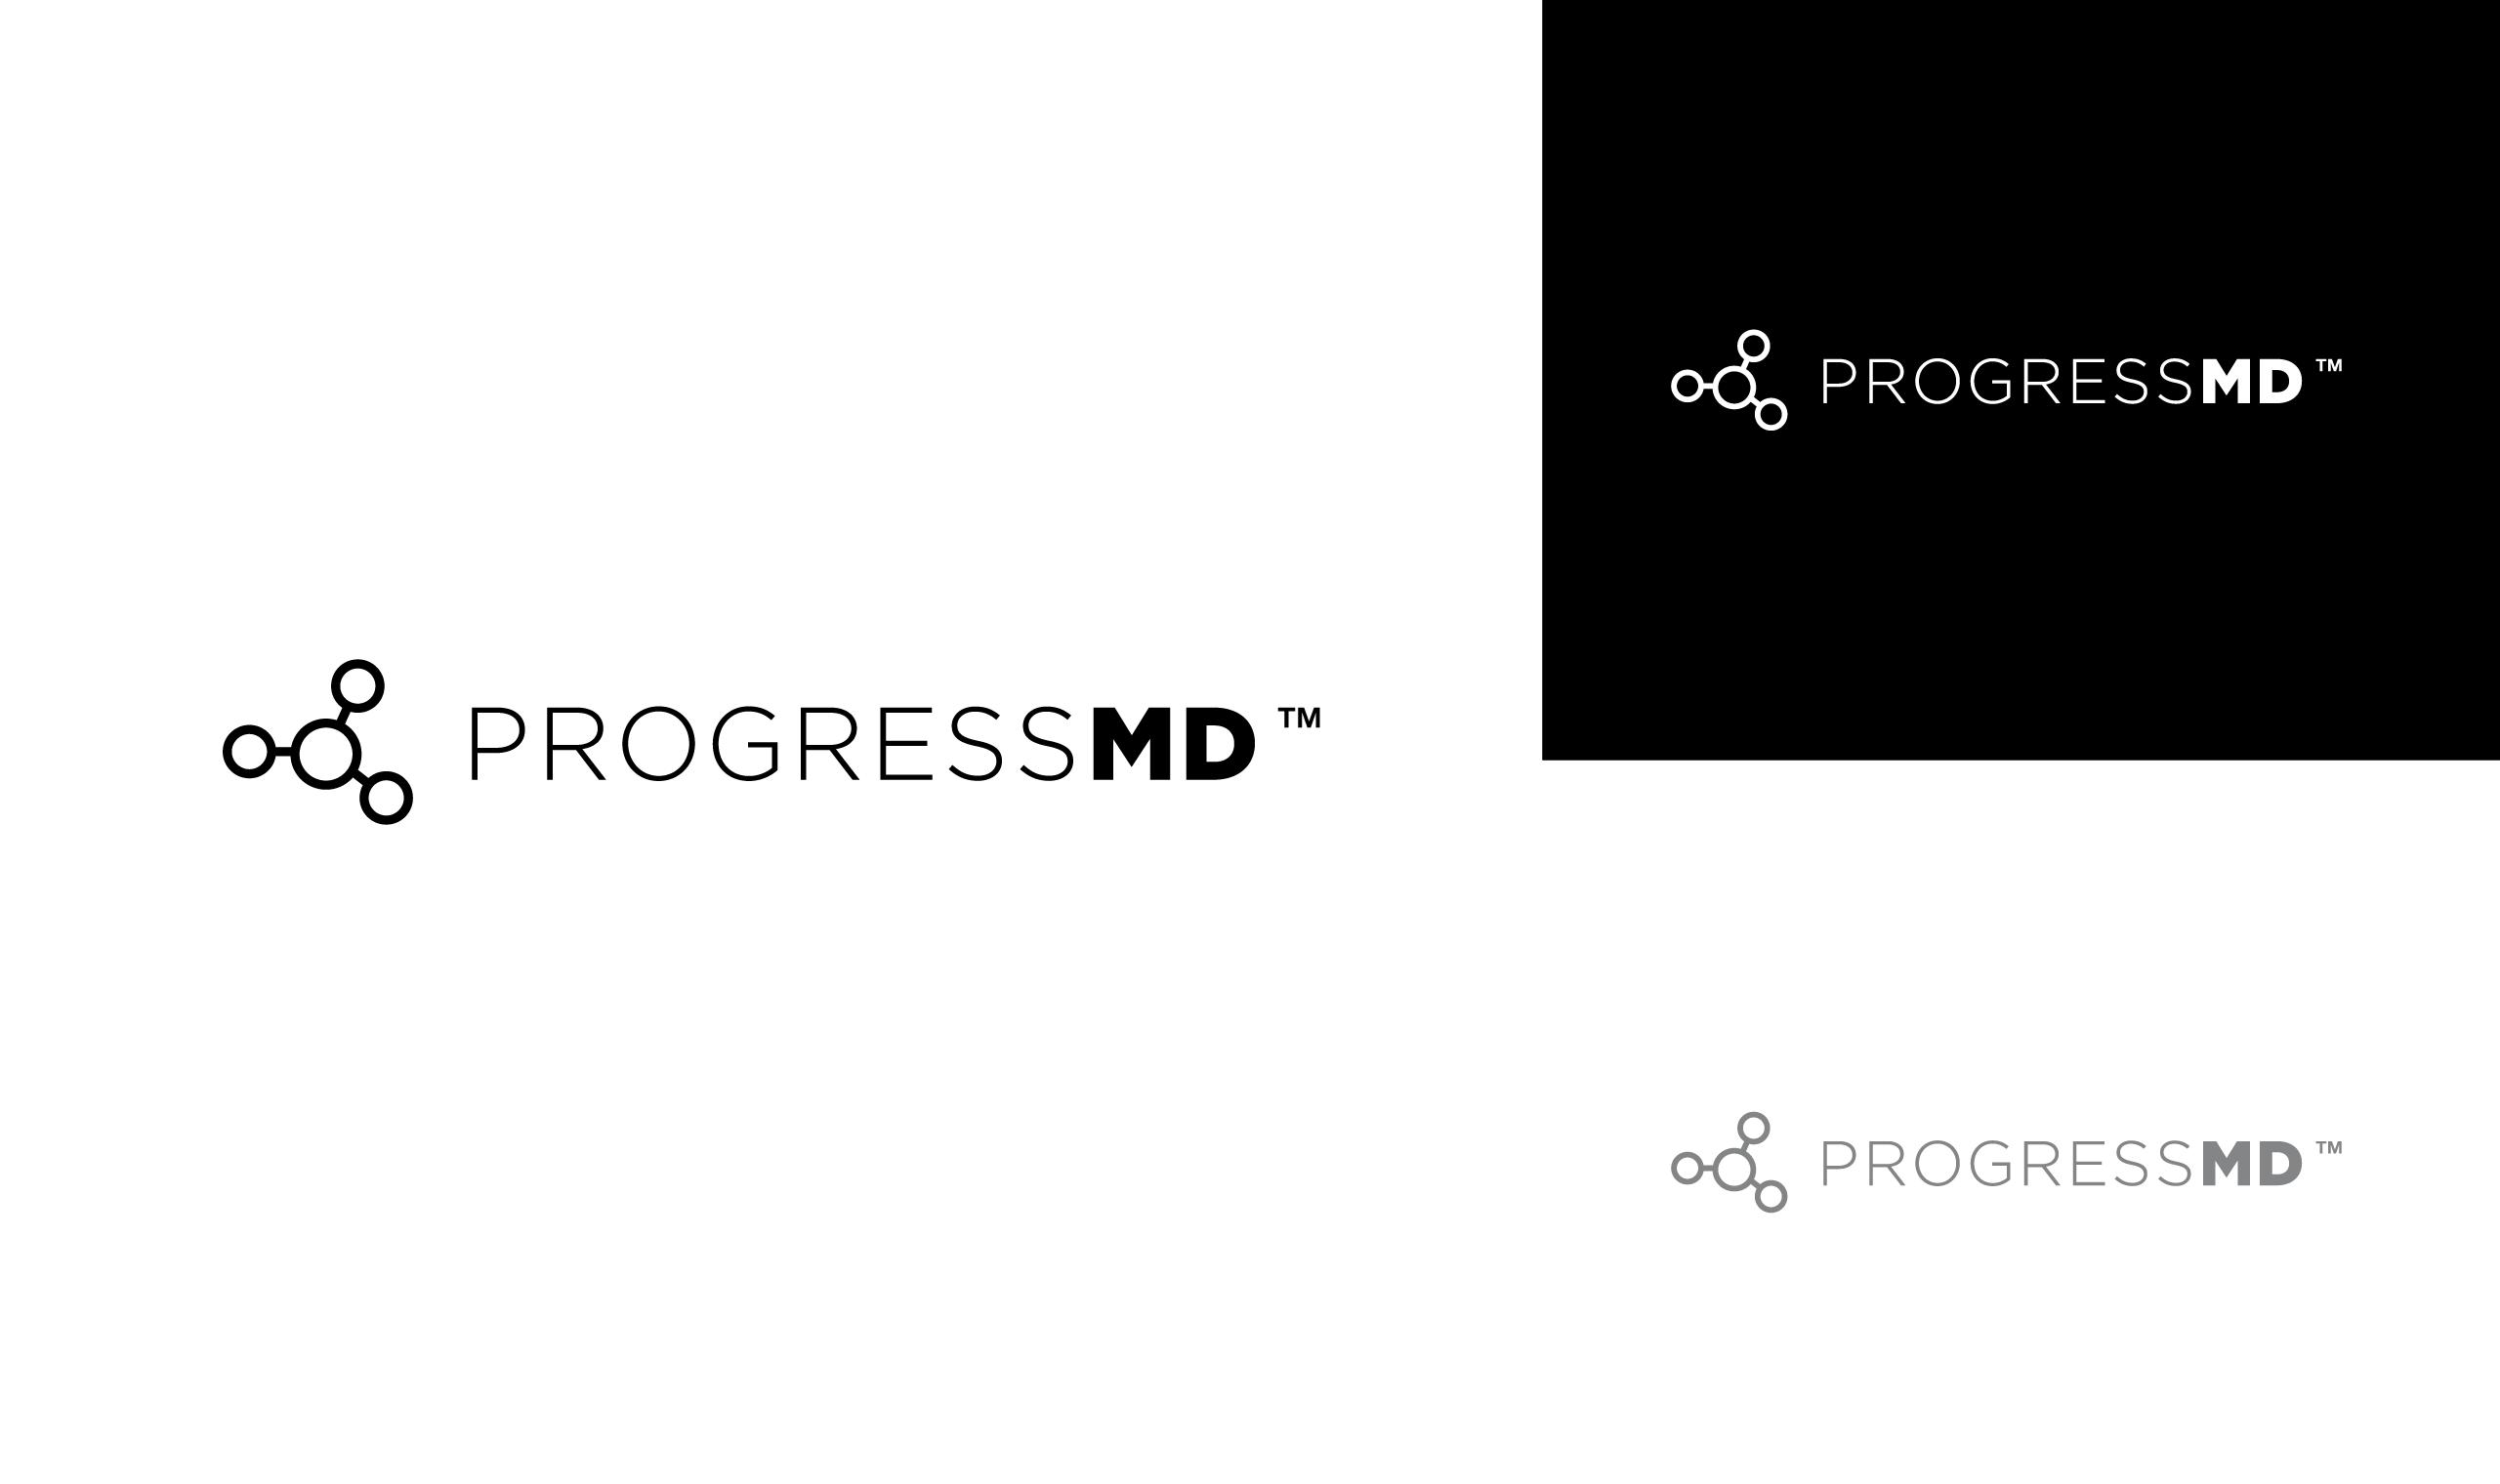 ProgressMD